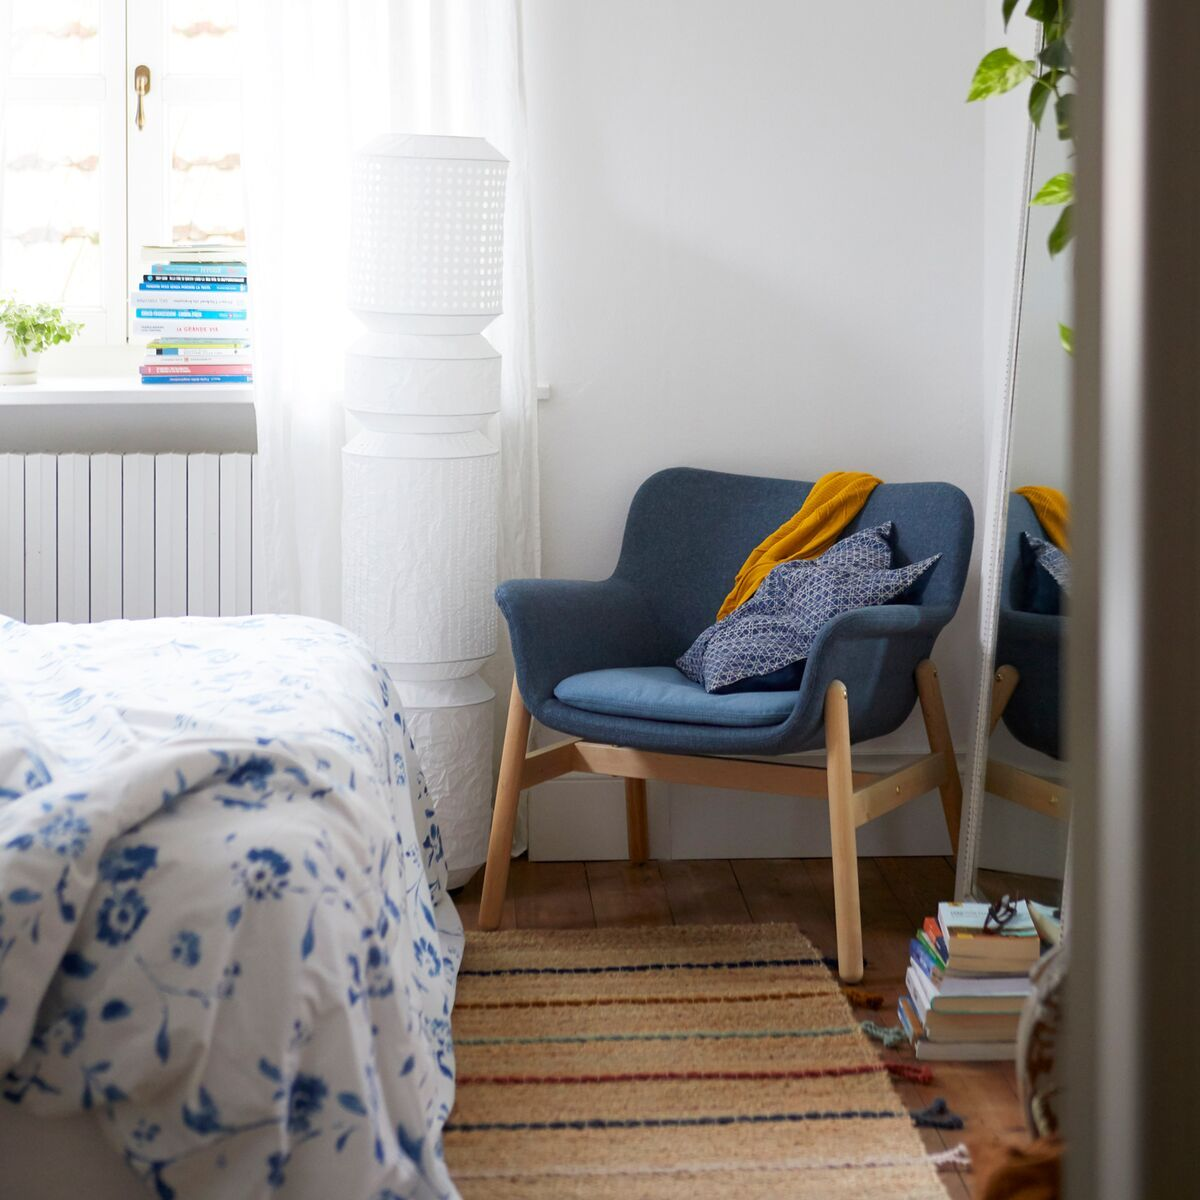 Vedbo Armchair Gunnared Blue Ikea Switzerland Bedroom Decor Inspiration Living Room Designs Living Room Trends